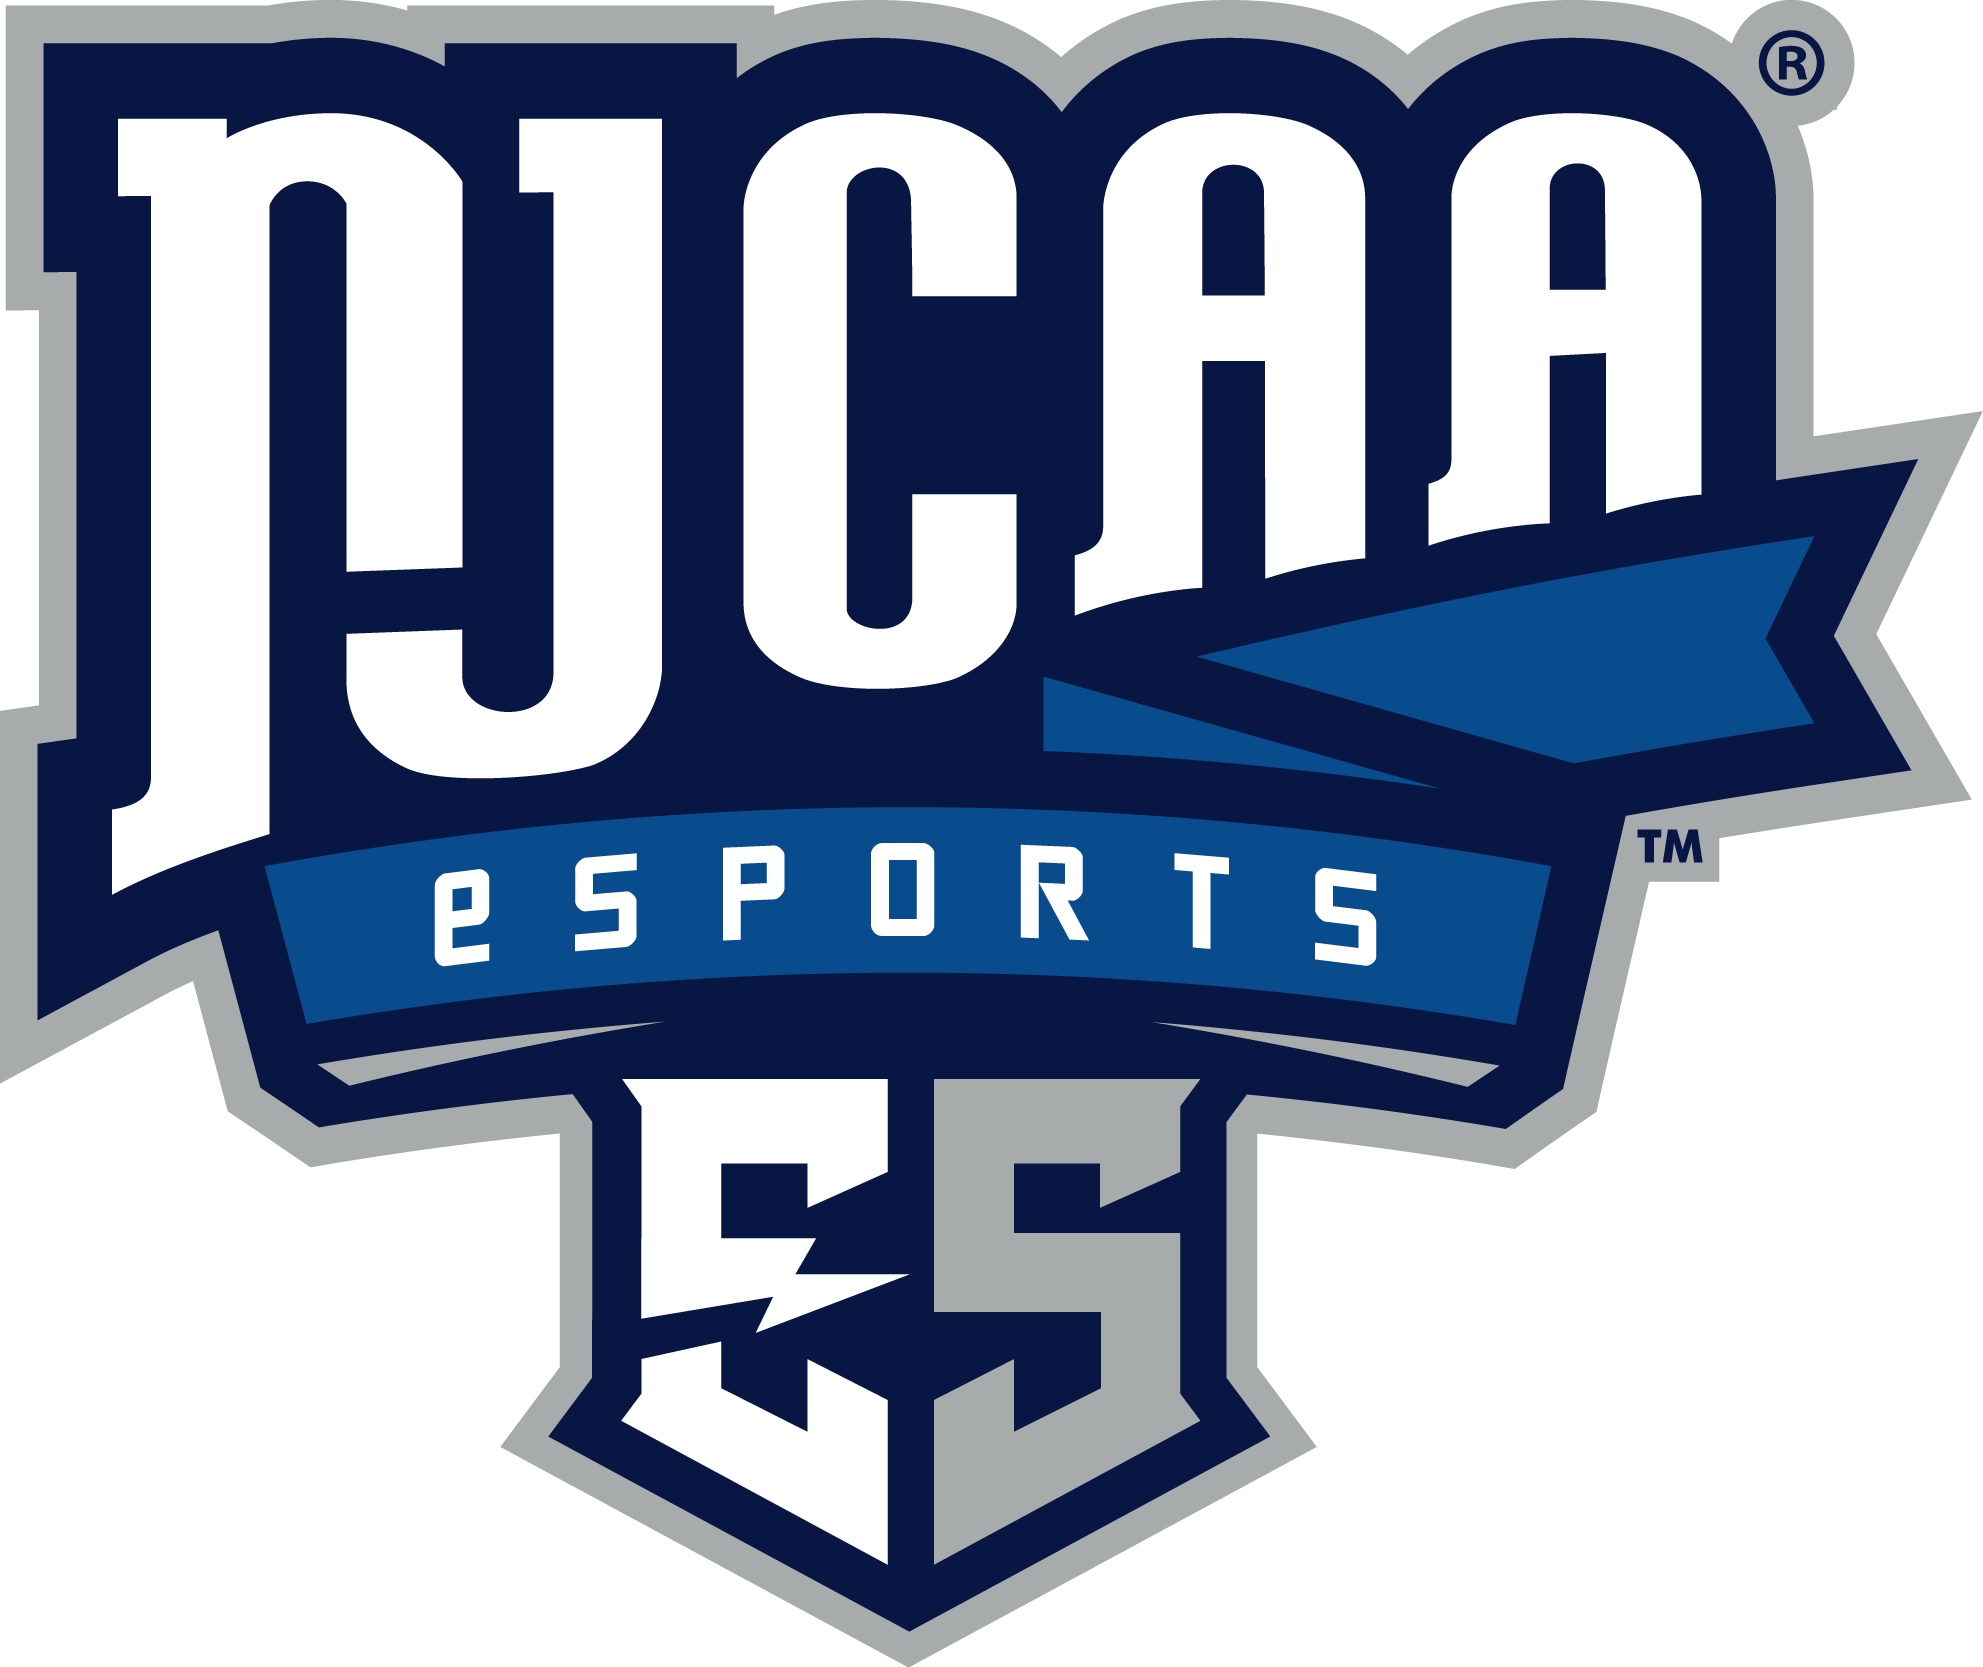 NAECAD Partner - National Junior College Athletic Association Esports